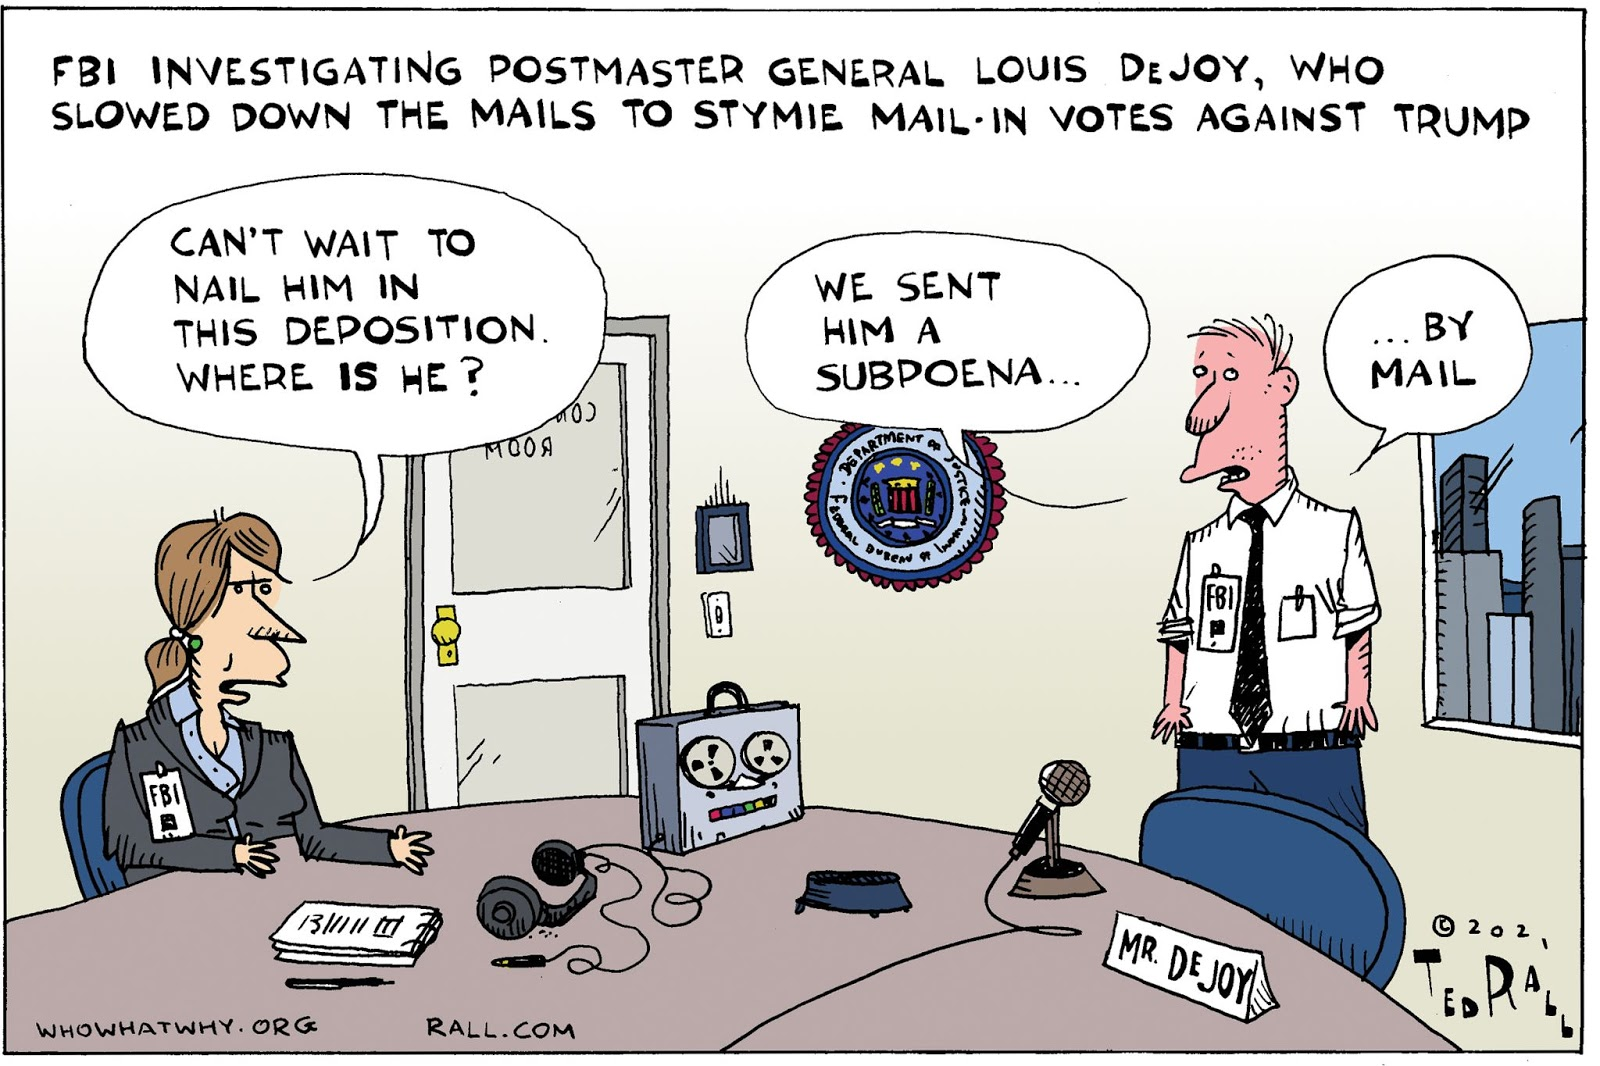 Post Office, Louis DeJoy, FBI